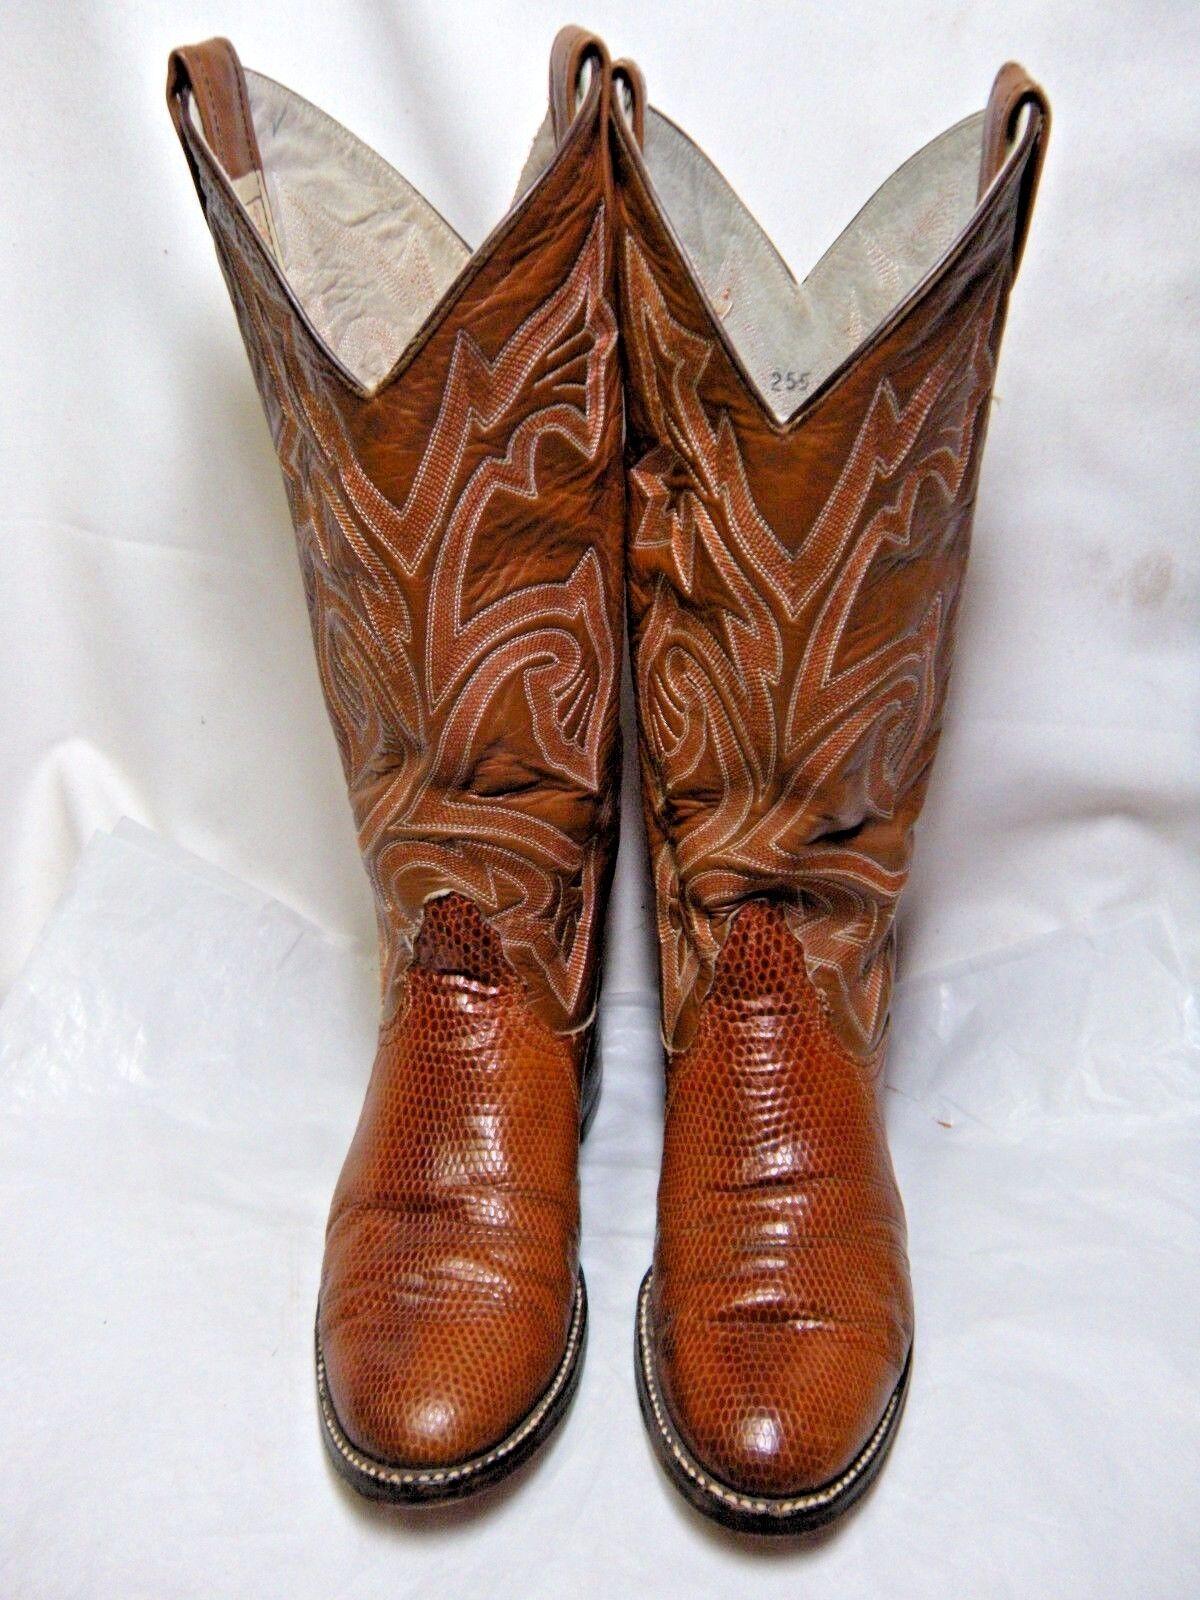 Larry Mahan's Womens Rare Oval Lizard Lizard Lizard Cowboy Boots Size 5.5 B Spice    67 OB ee469e